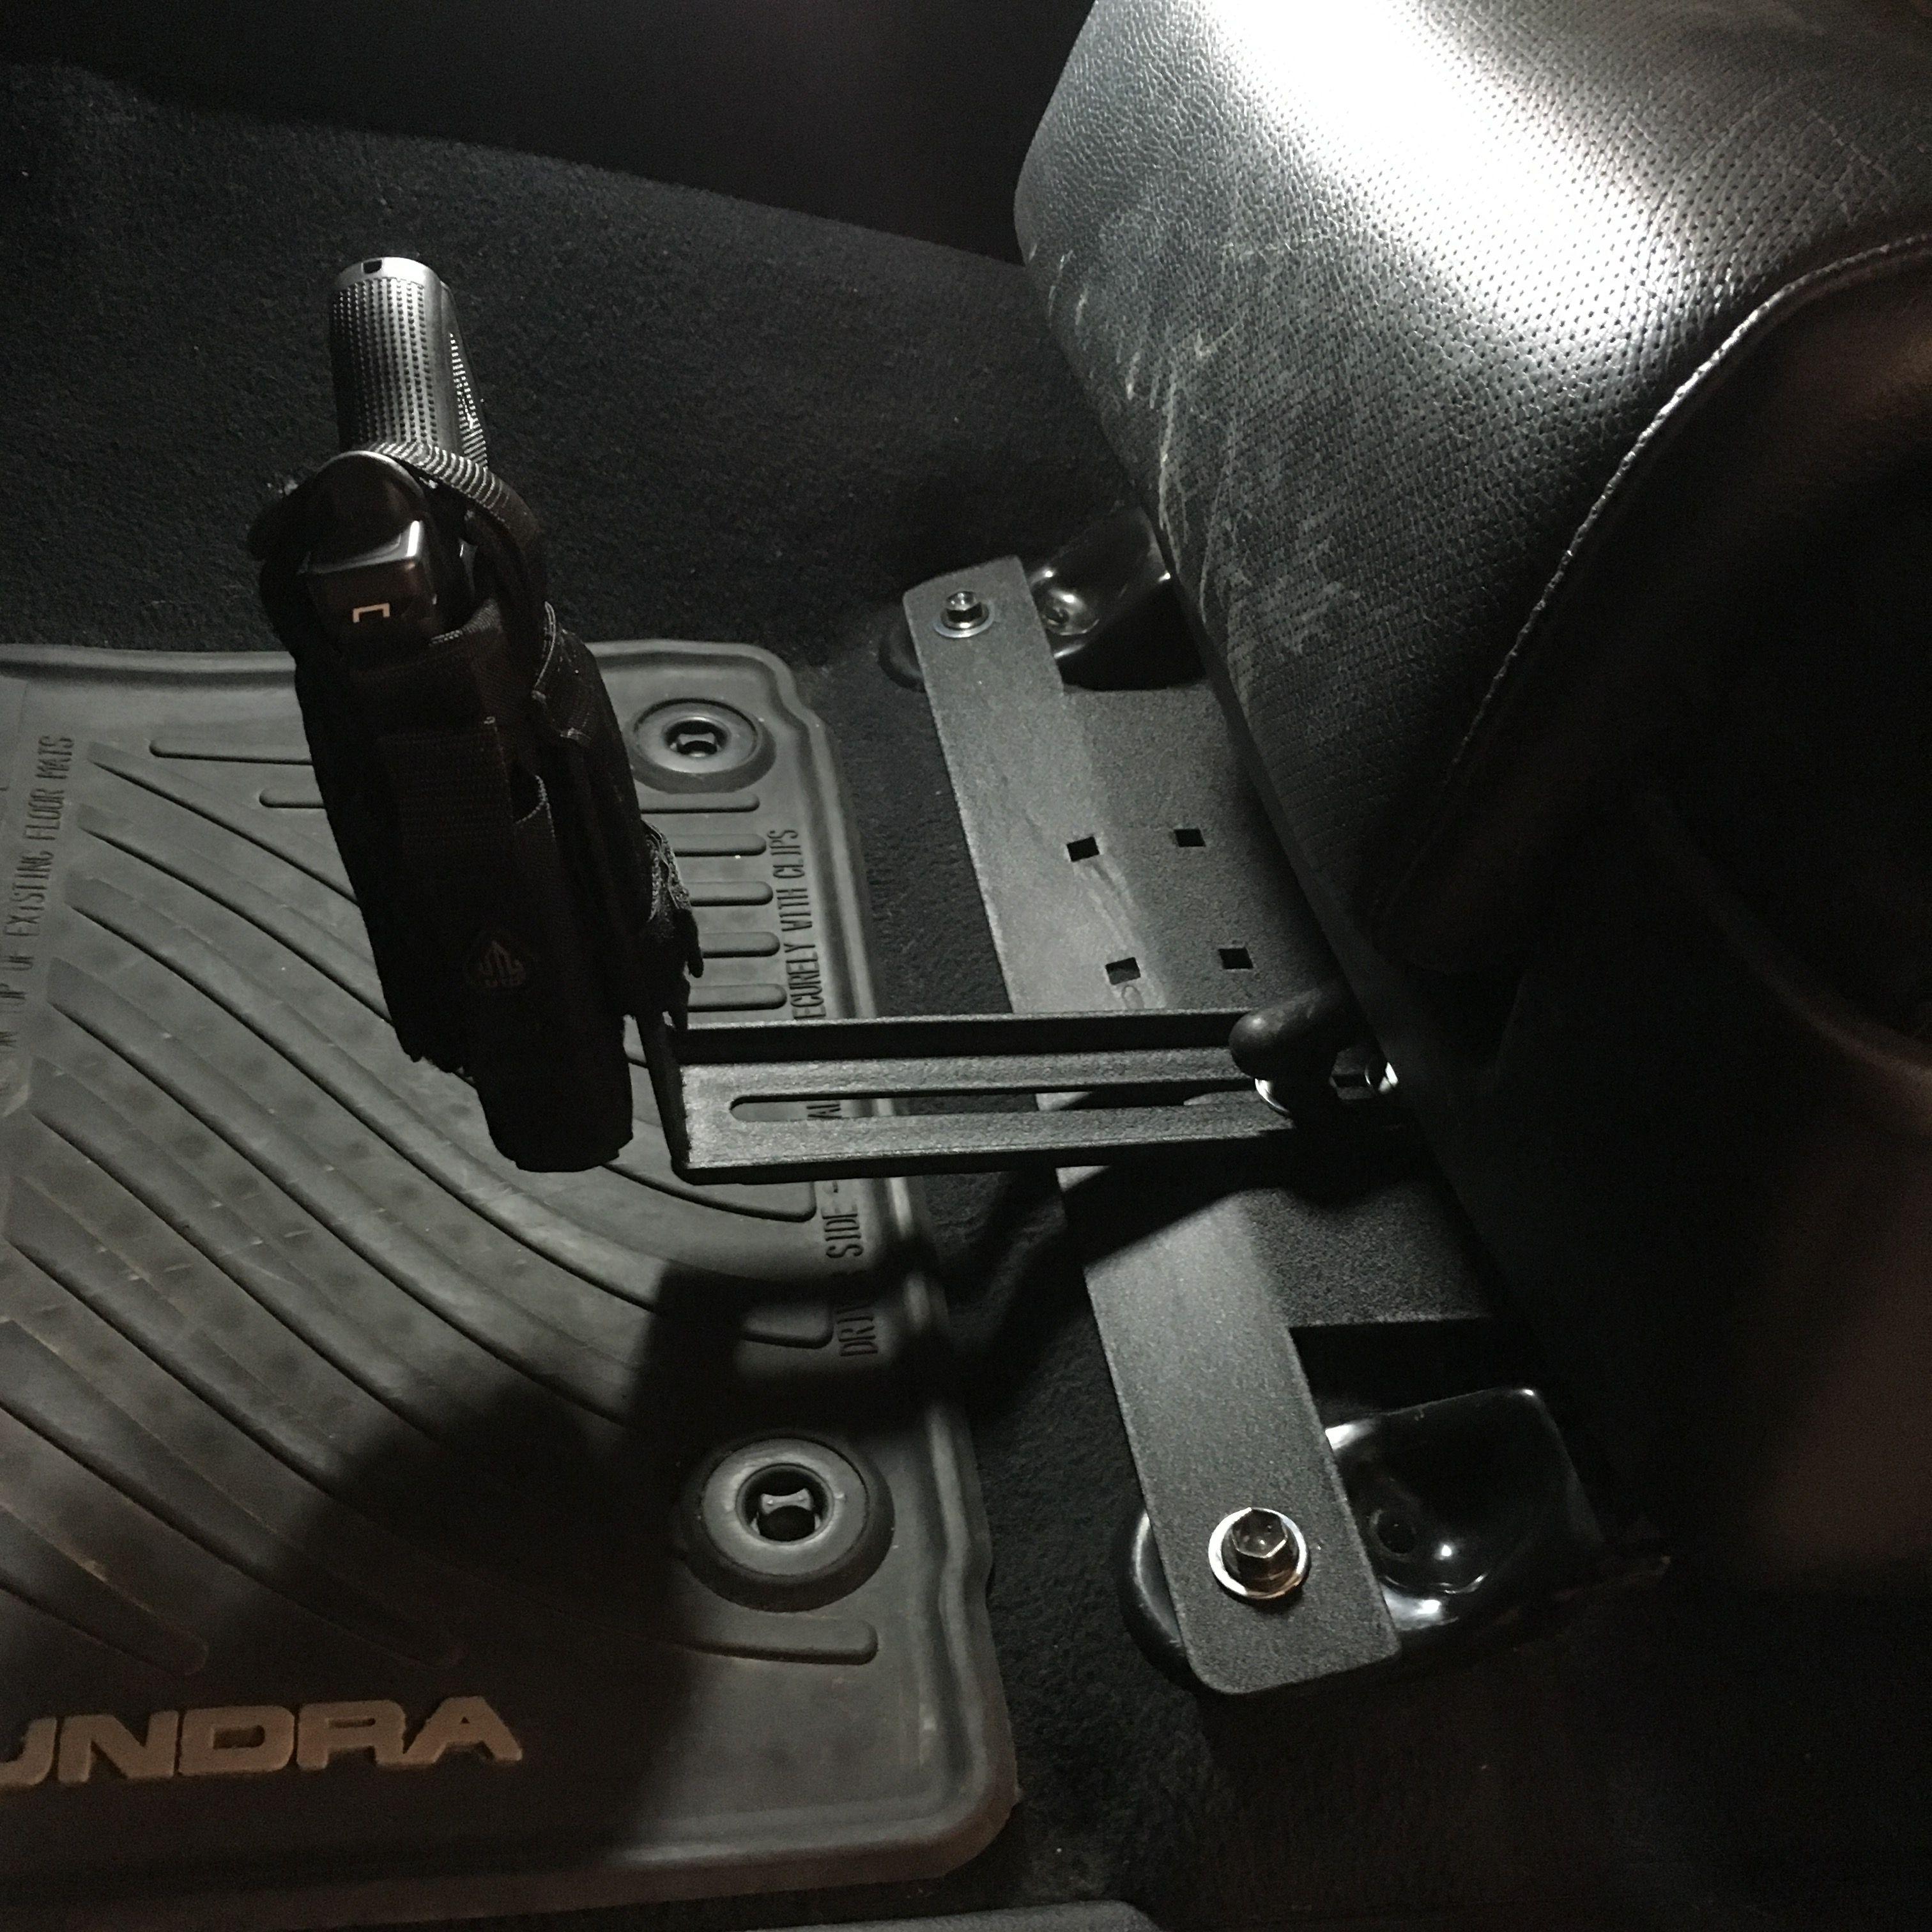 Toyota Tundra Adjustable Pistol Mount Car Storage Pistol Jeep